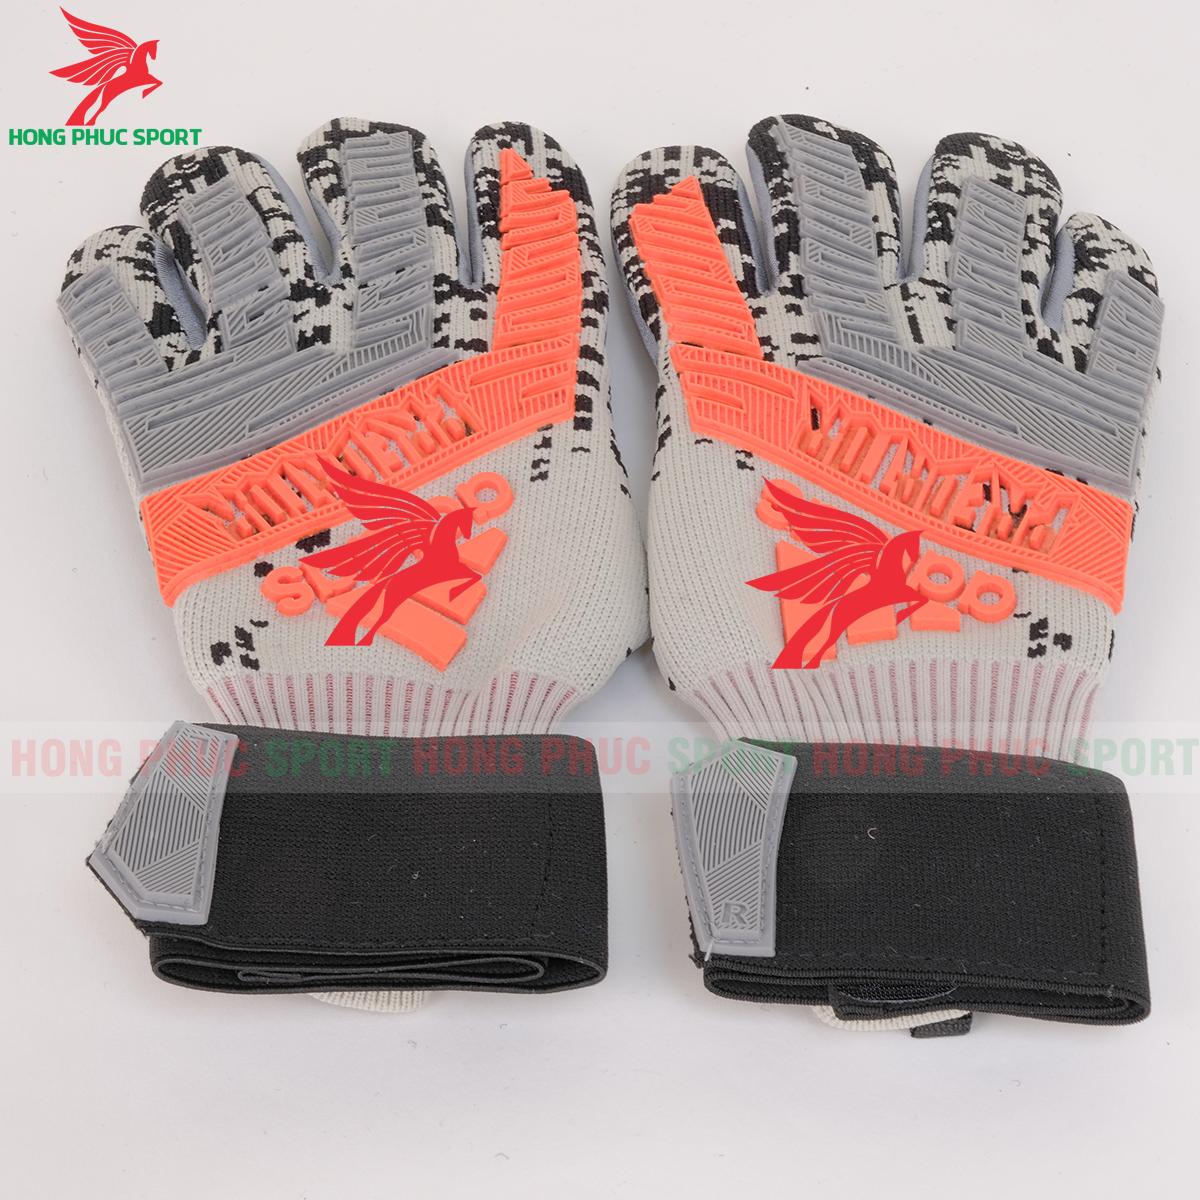 https://cdn.hongphucsport.com/unsafe/s4.shopbay.vn/files/285/gang-tay-thu-mon-adidas-predator-mau-xam-da-5f7c3e8c8a42a.png